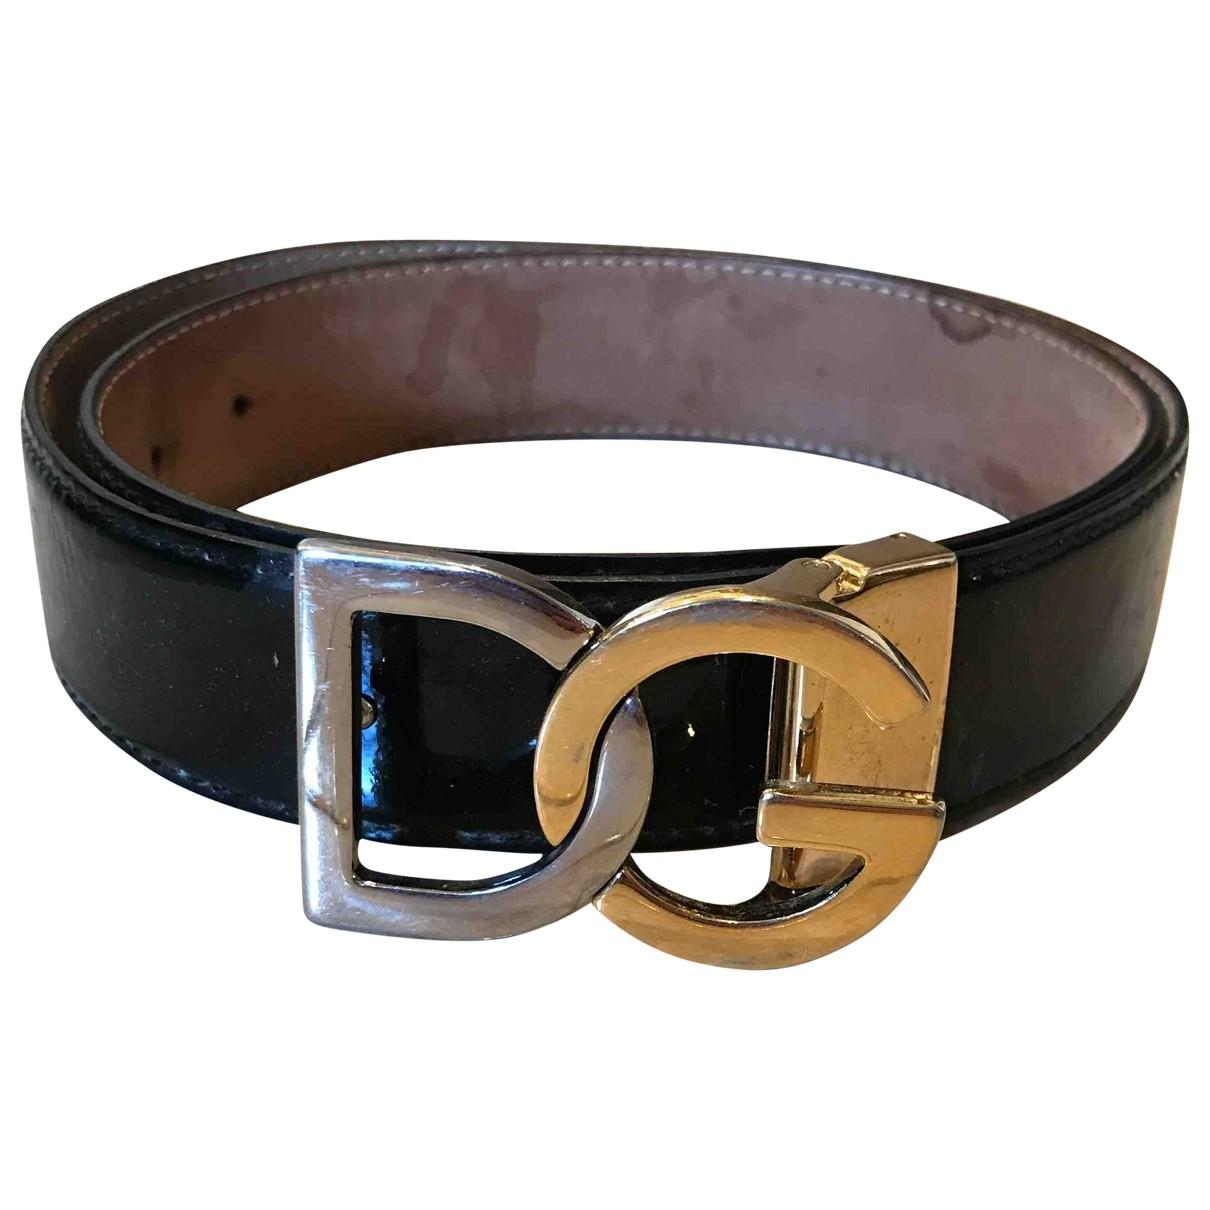 Dolce & Gabbana \N Black Patent leather belt for Women 85 cm